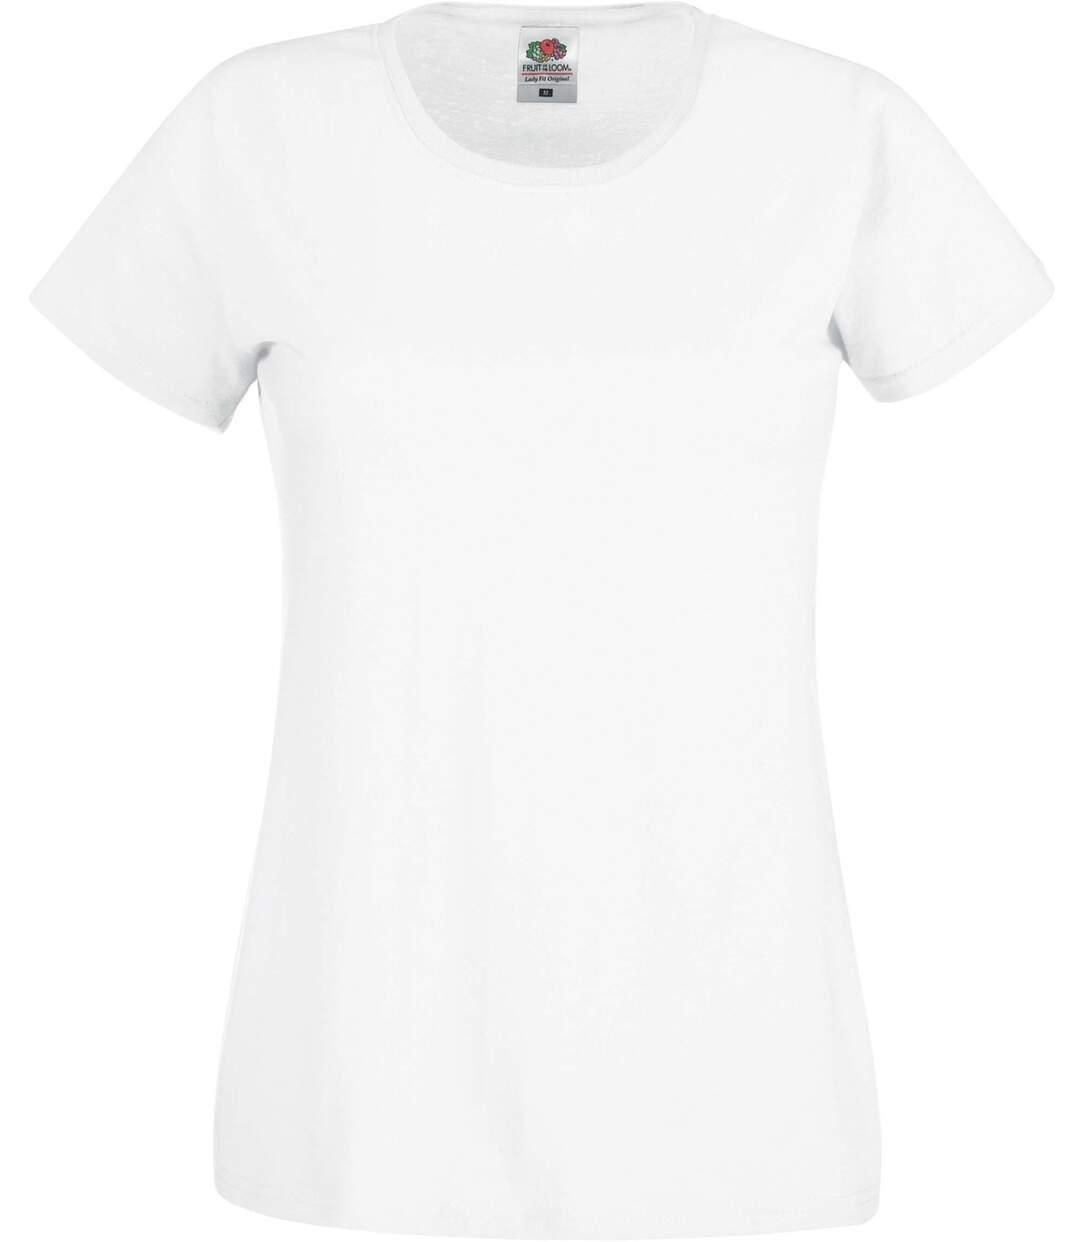 T-shirt léger manches courtes col rond